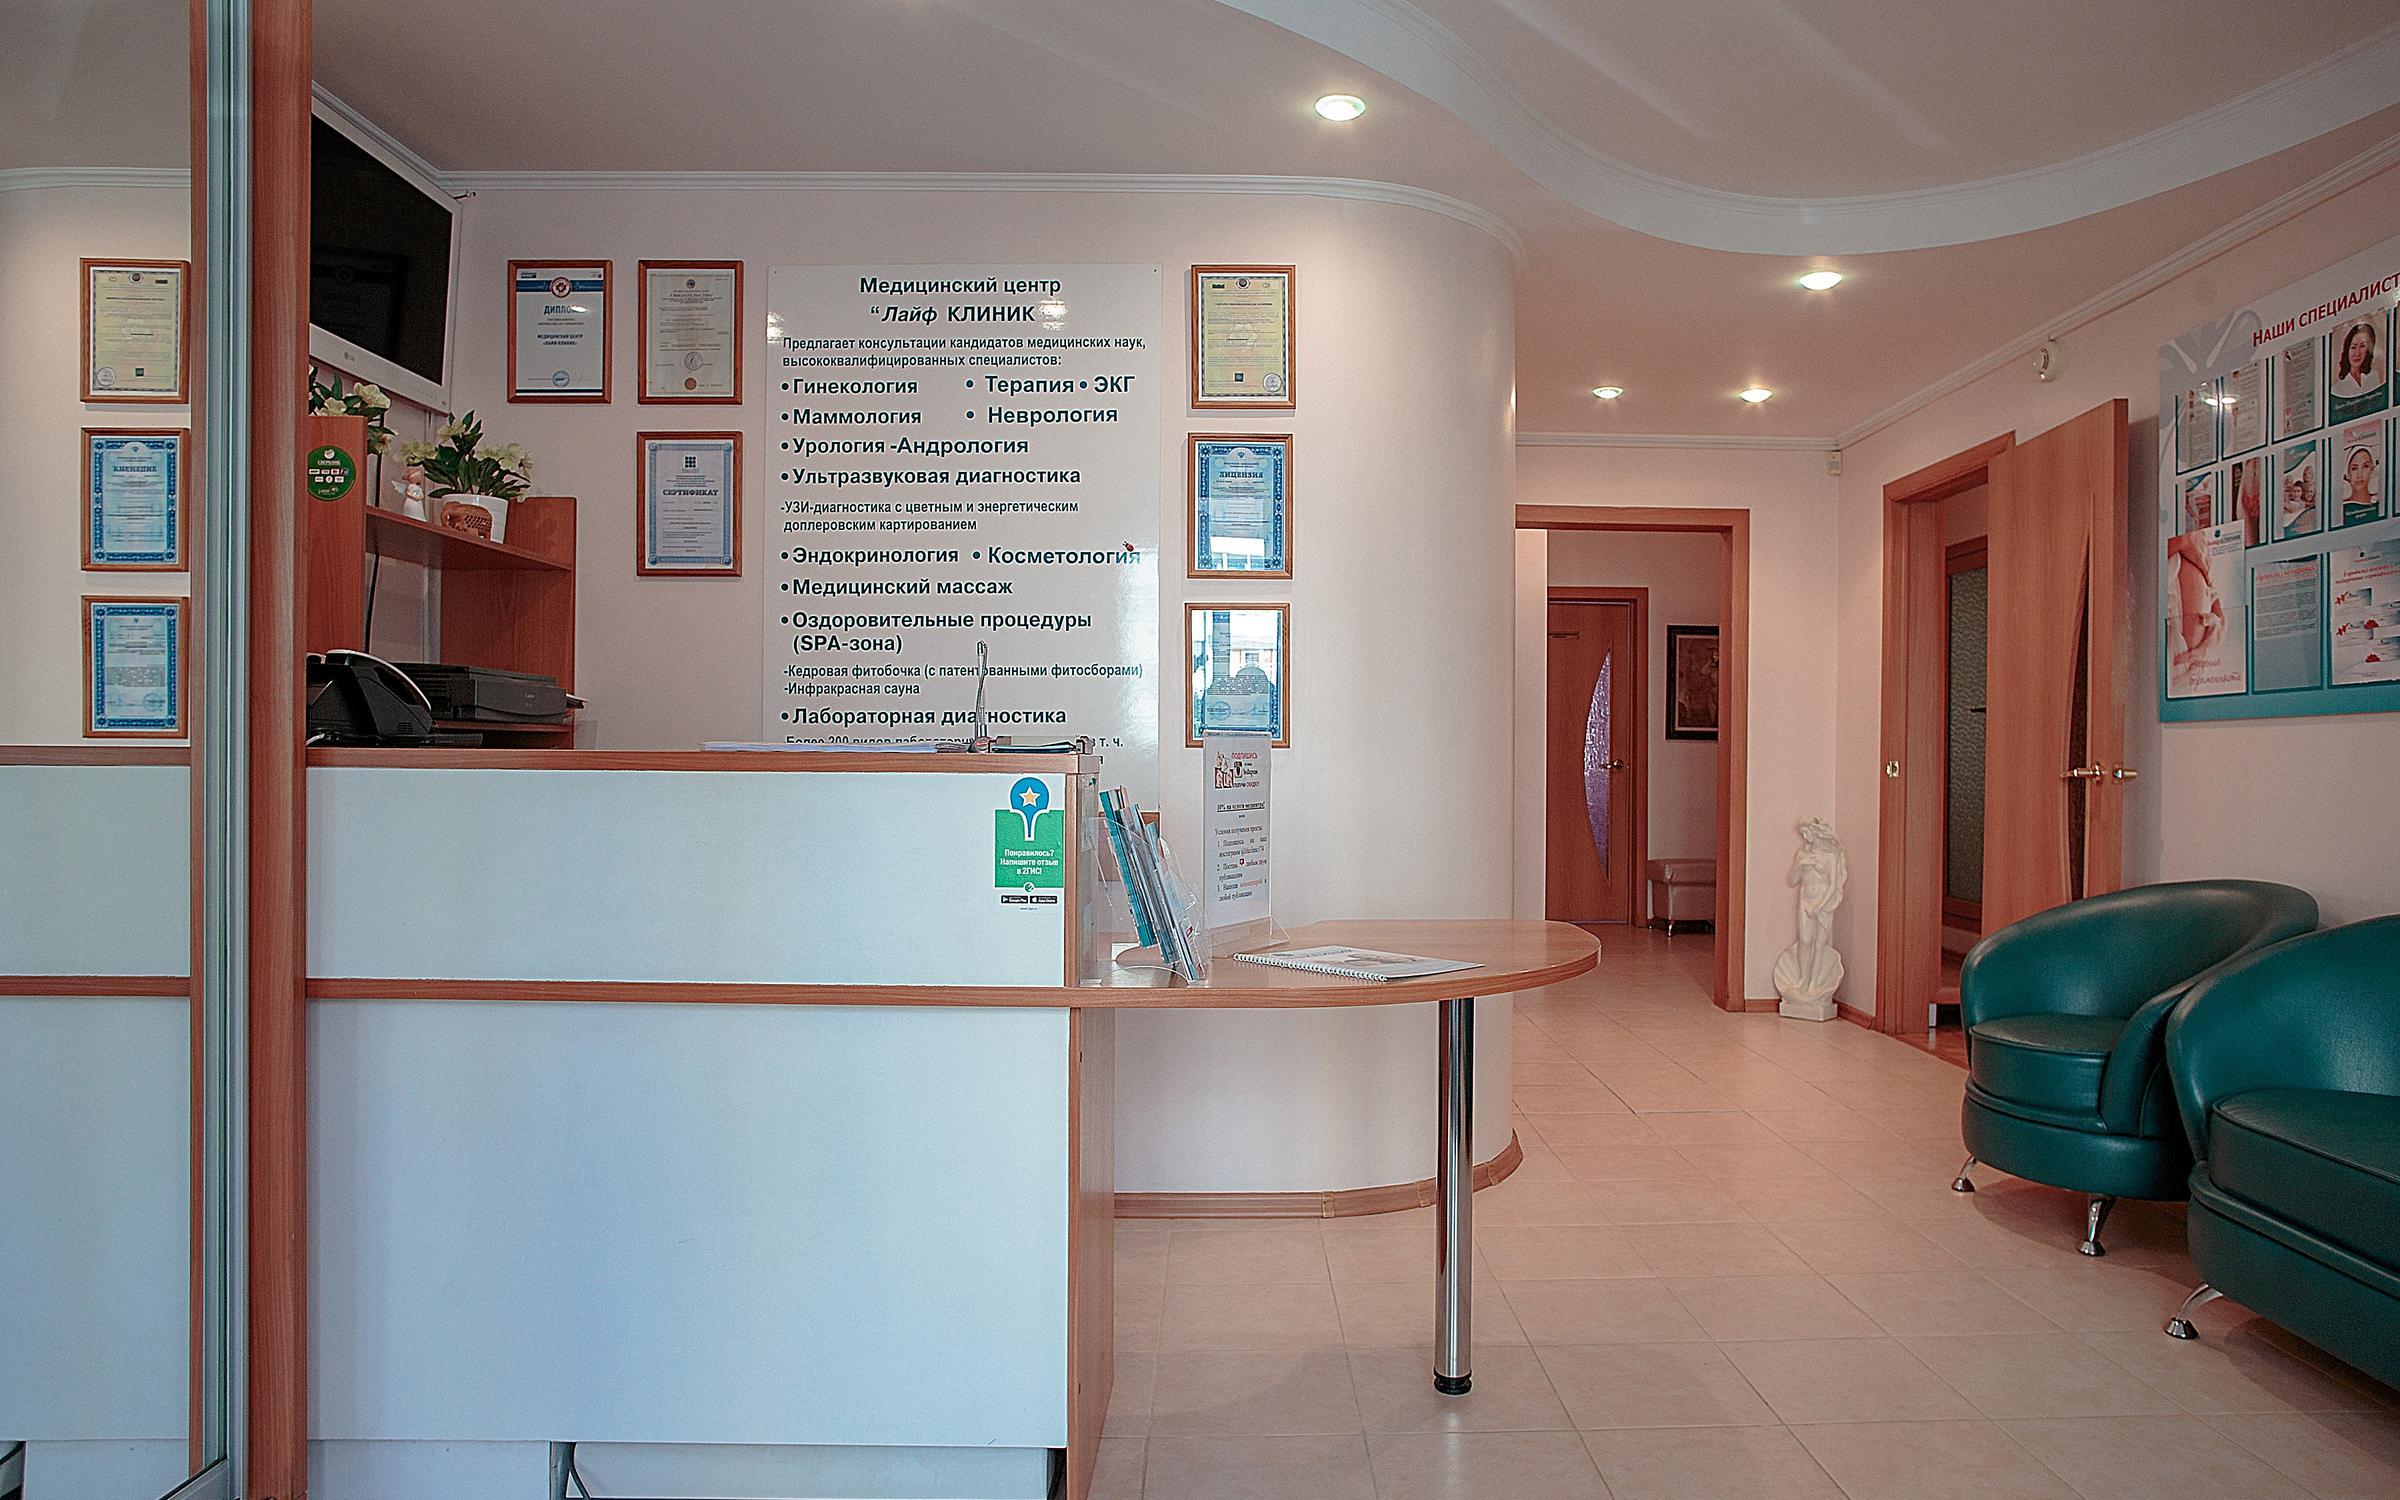 фотография Медицинского центра Лайф КЛИНИК на улице Академика Королёва